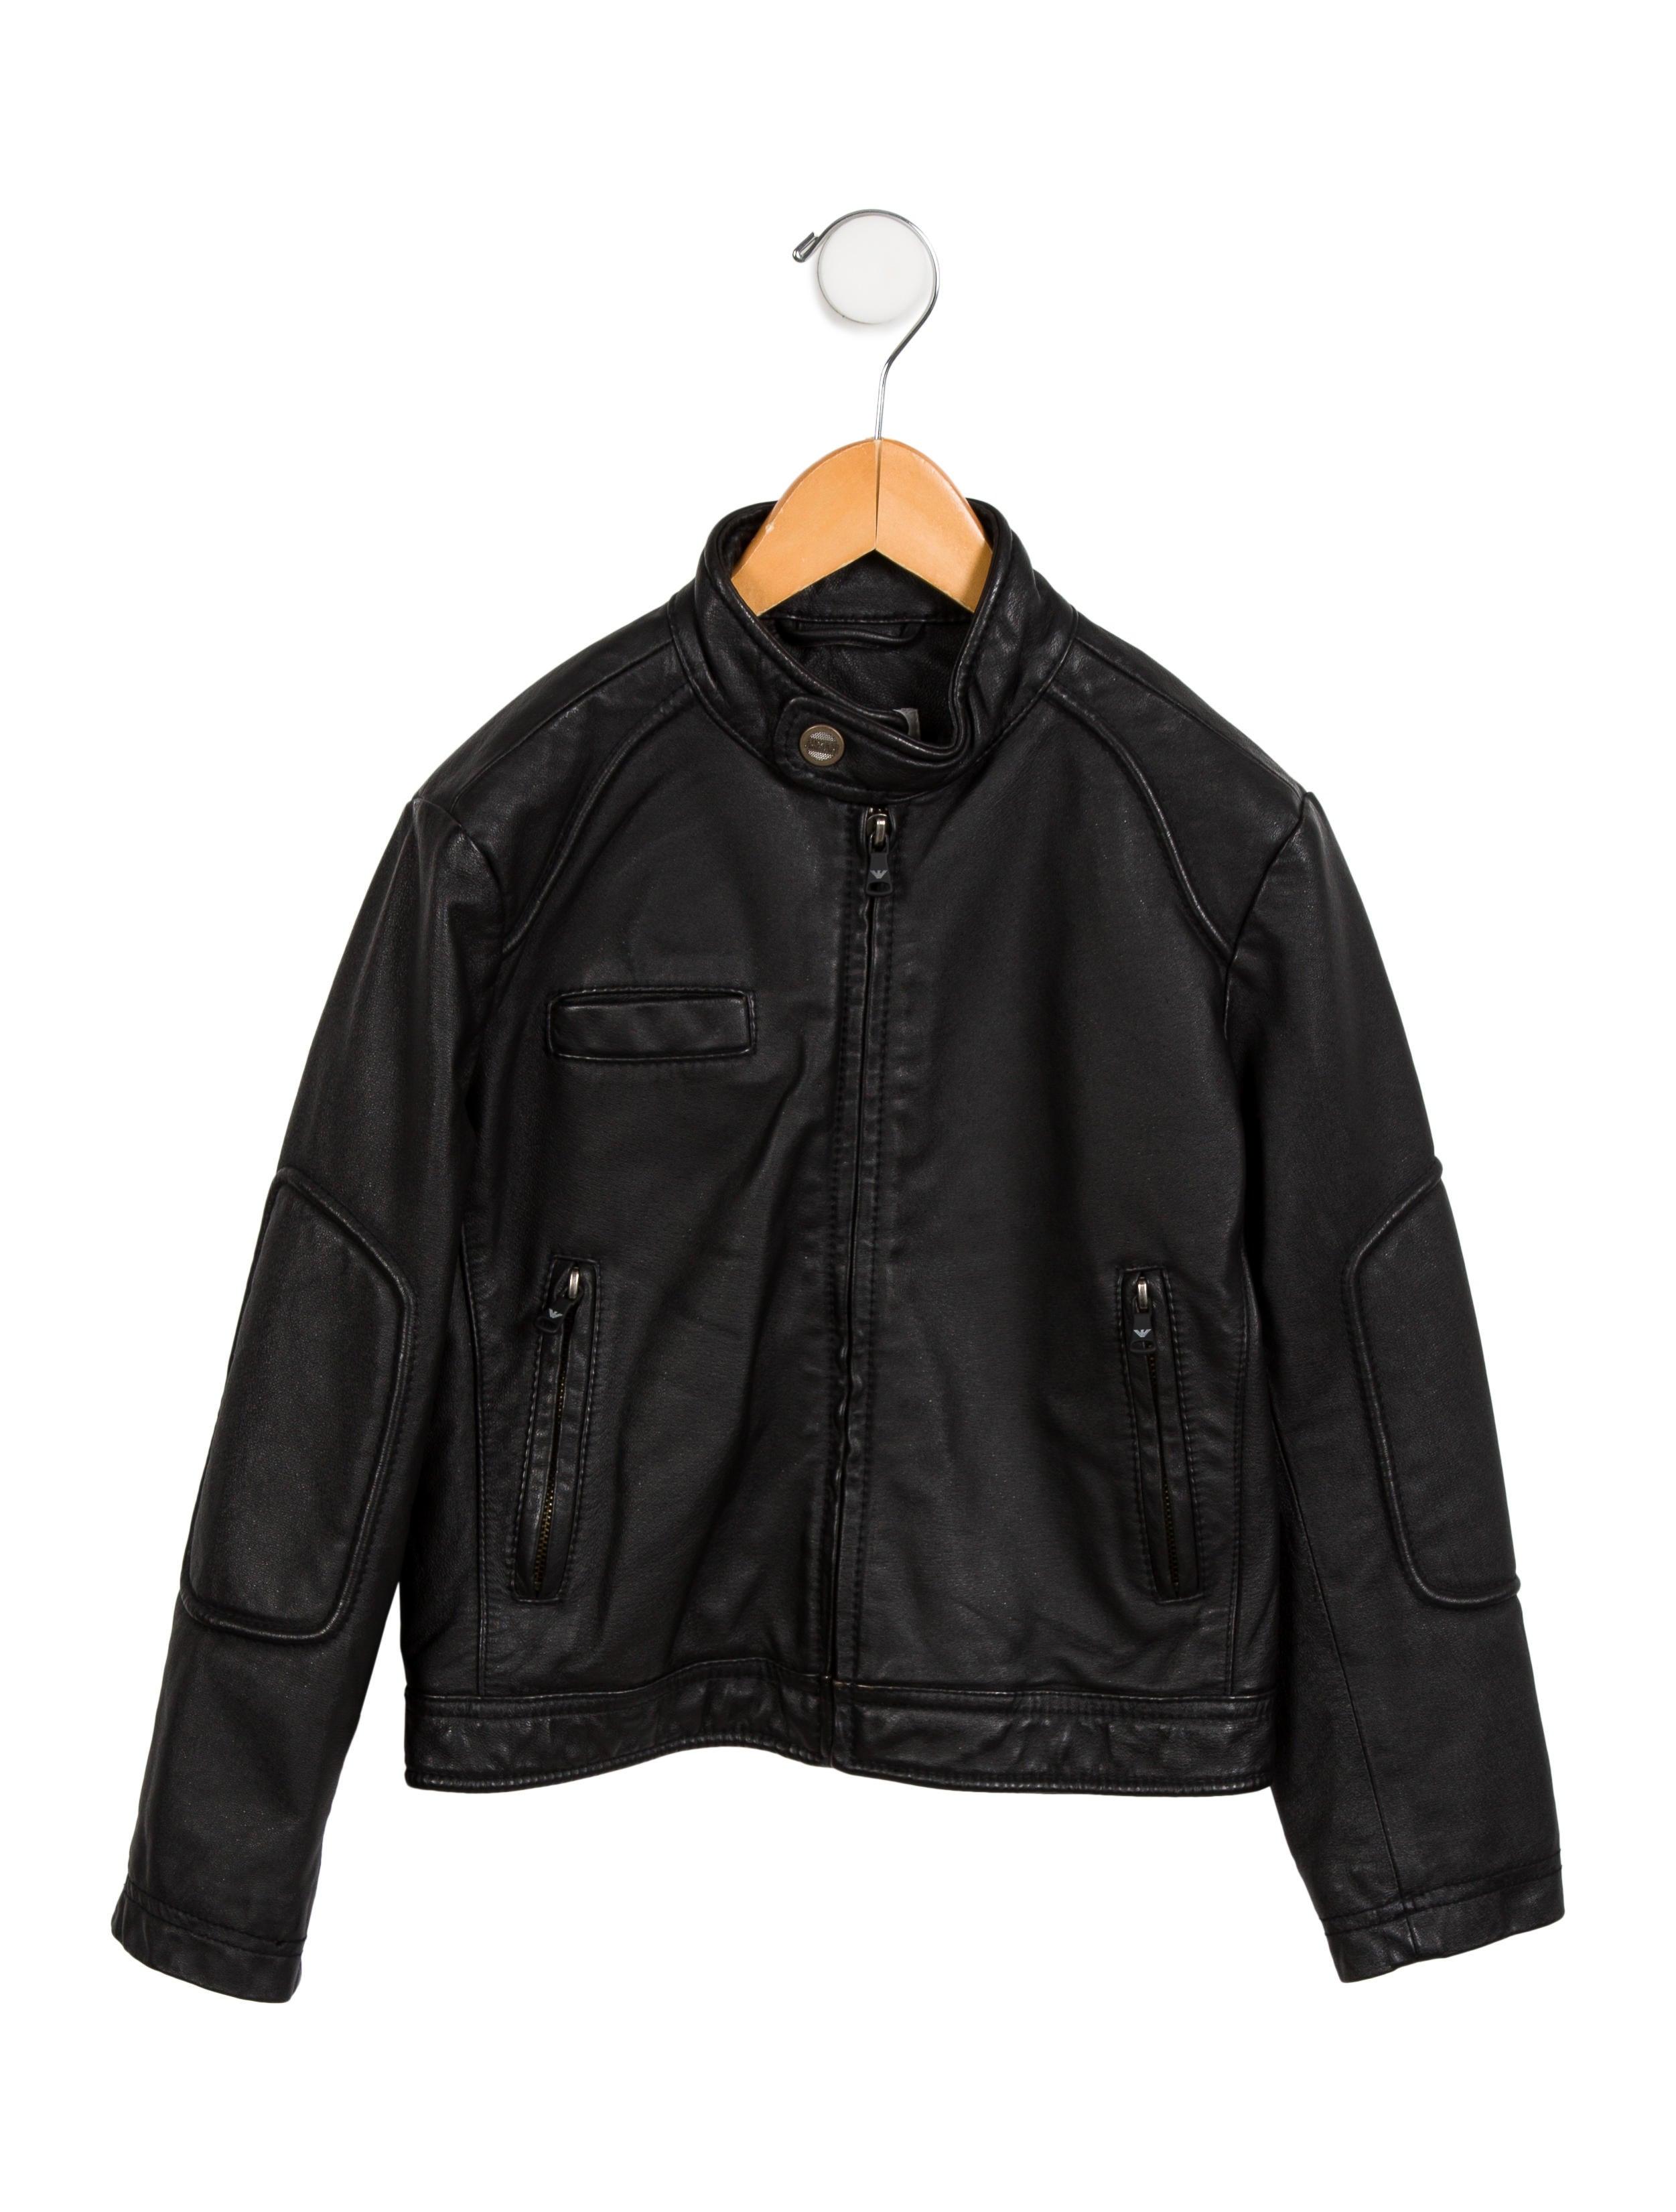 Junior leather jacket